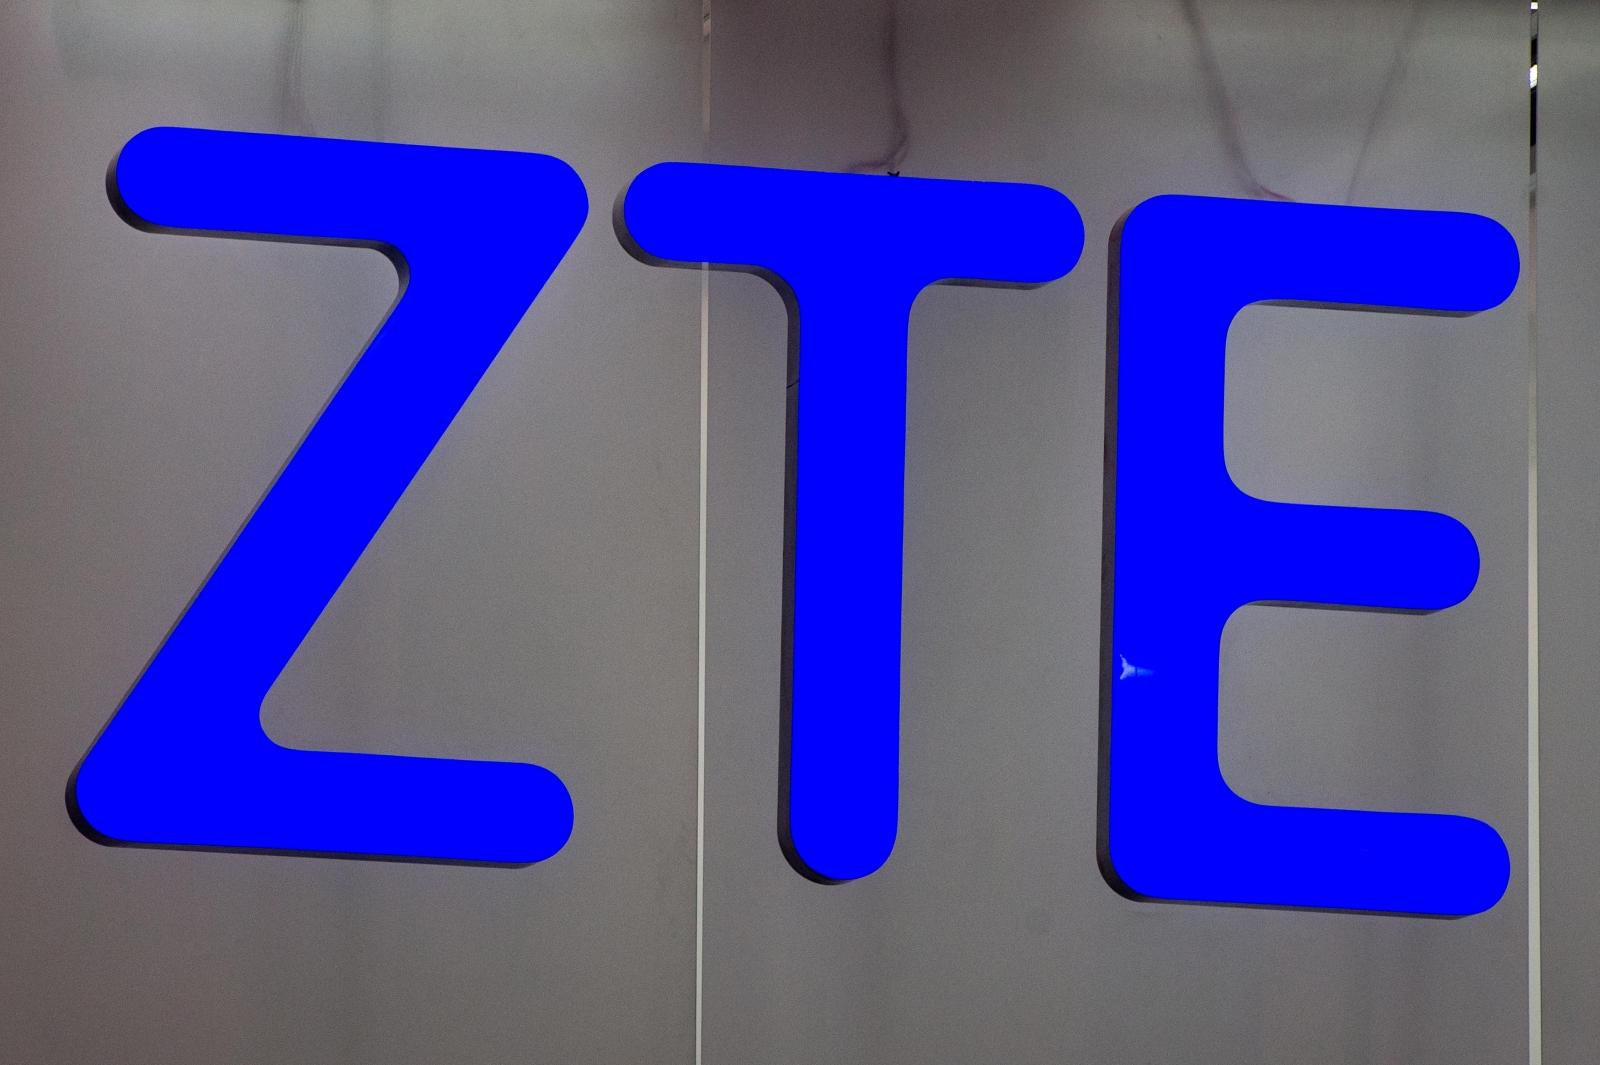 Dougia says: zte quartz restarting on its own given its